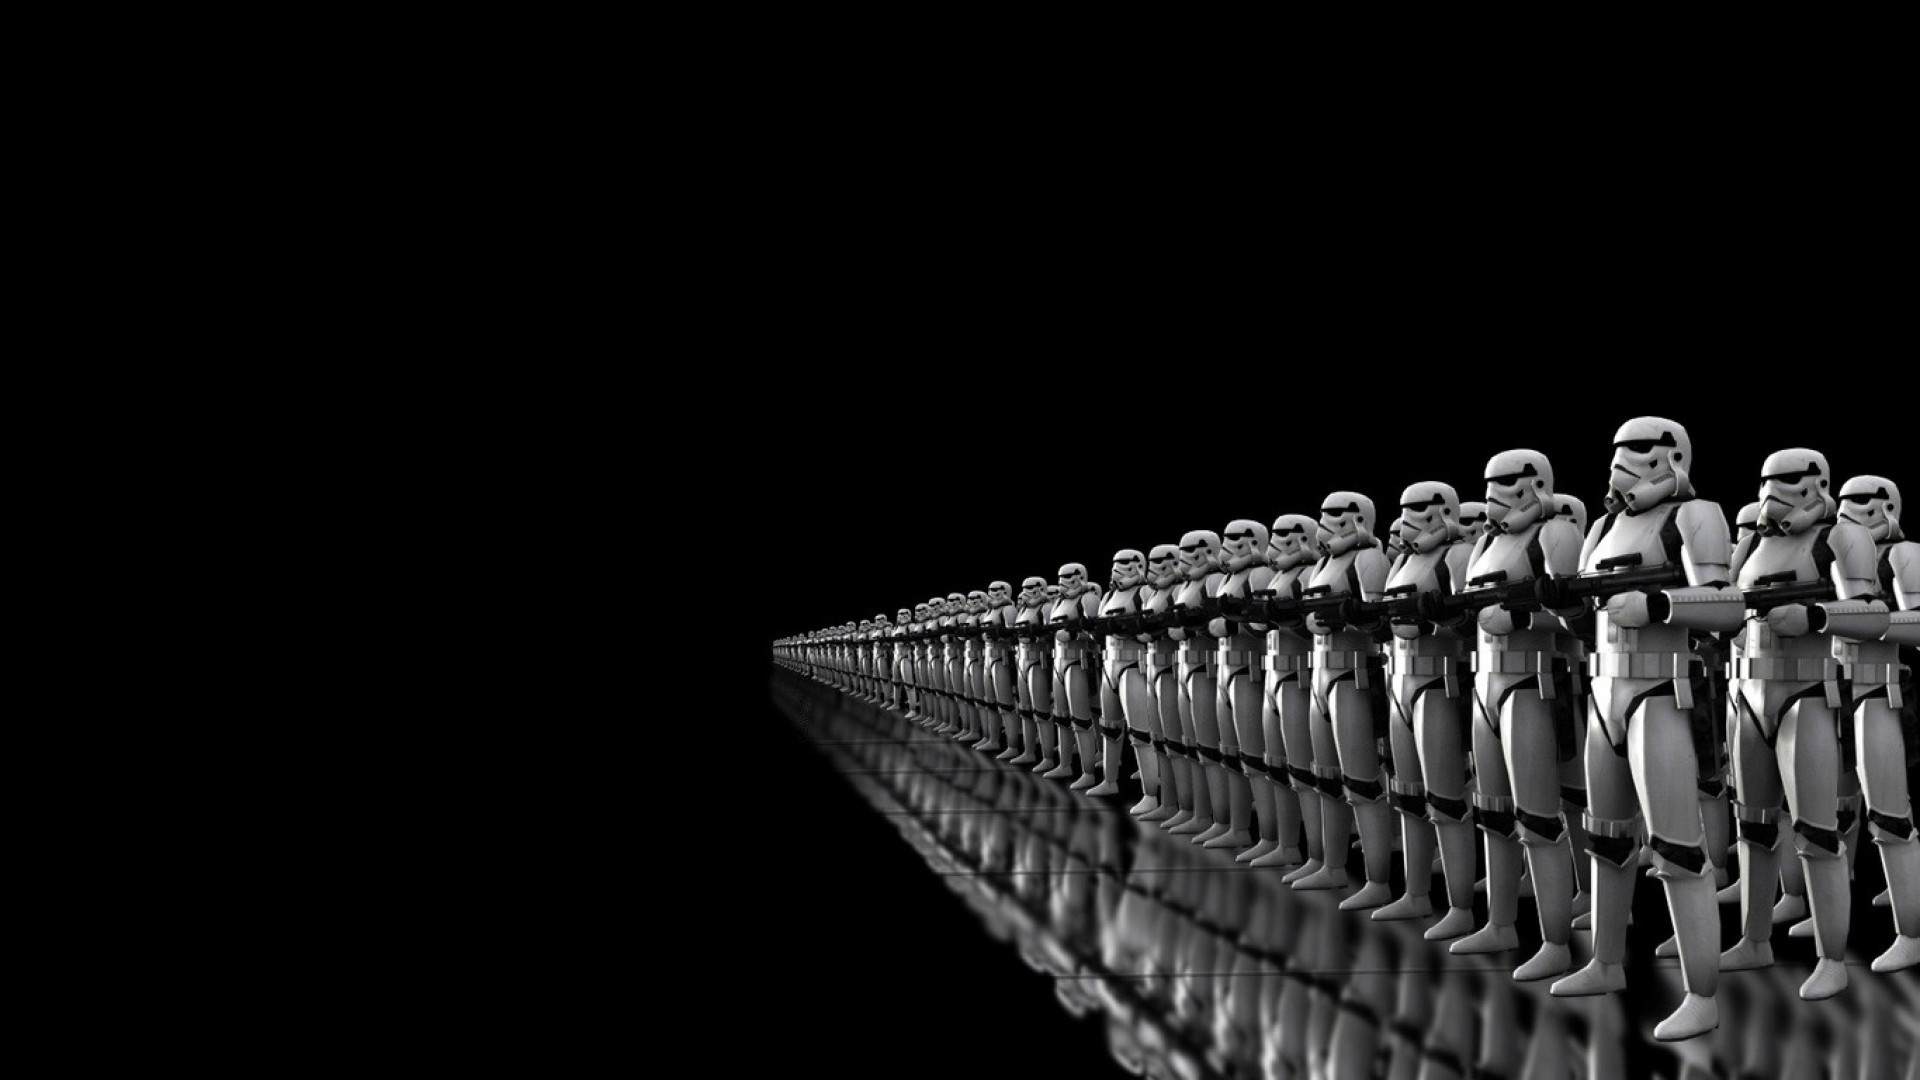 Star Wars Empire Pictures For Desktop Wallpaper 1920 x 1080 px 623.08 KB  lightsaber clone troopers